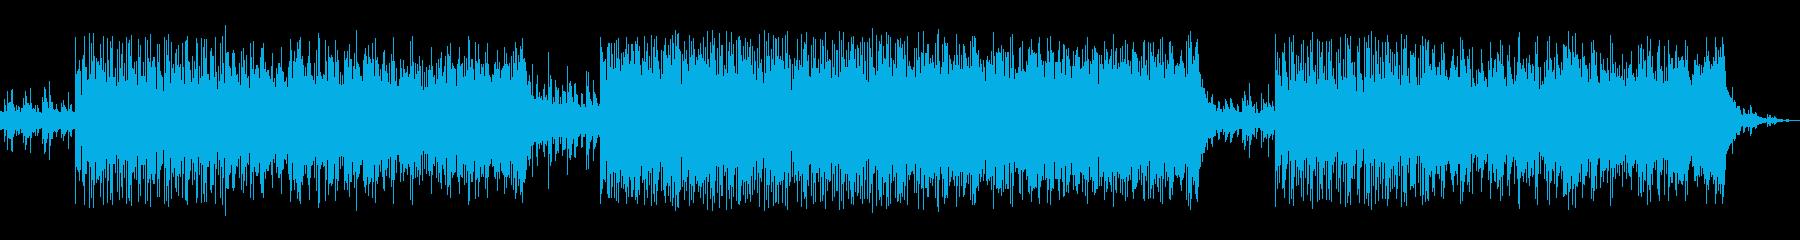 Jazz風の曲で映像・アニメゲームに最適の再生済みの波形